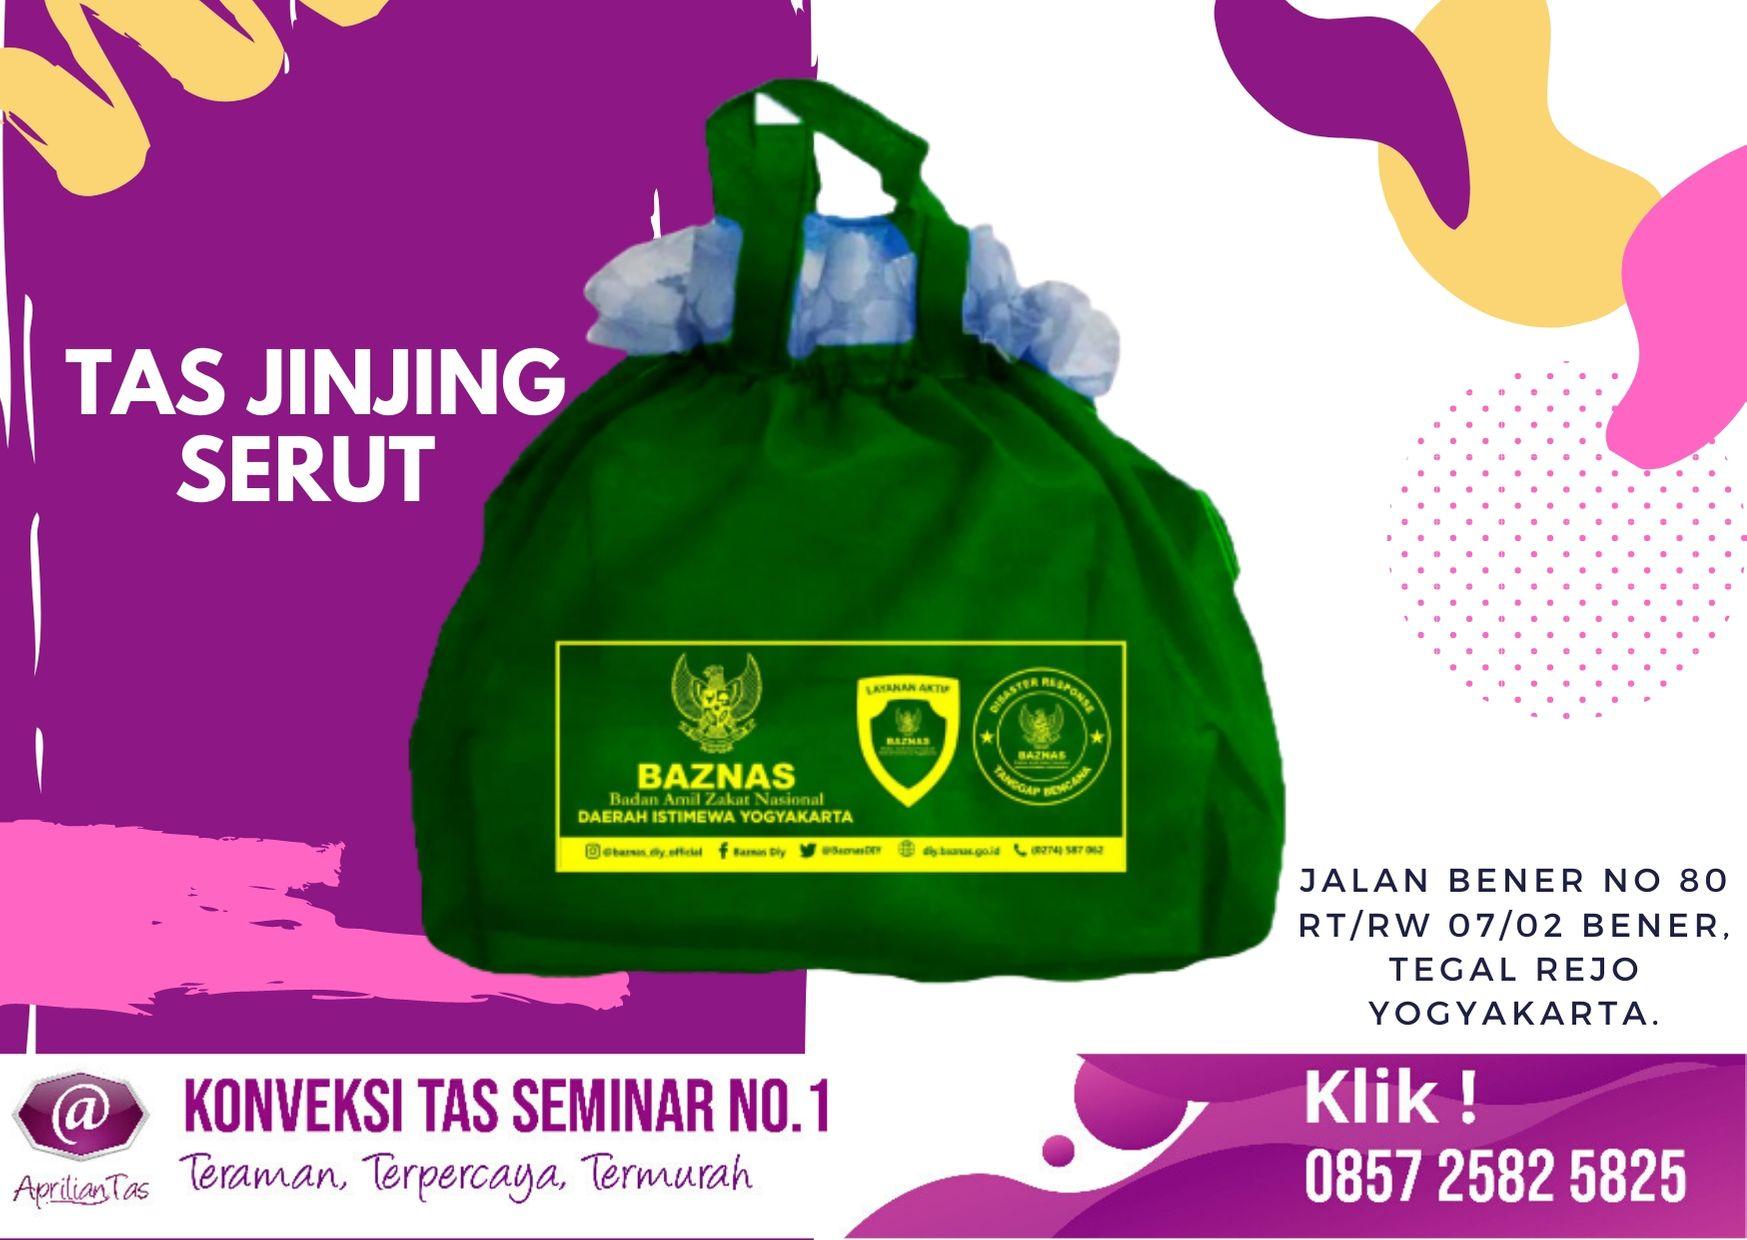 Tas Jinjing Pesanan Baznas DI Yogyakarta di Grosir Tas Jogja